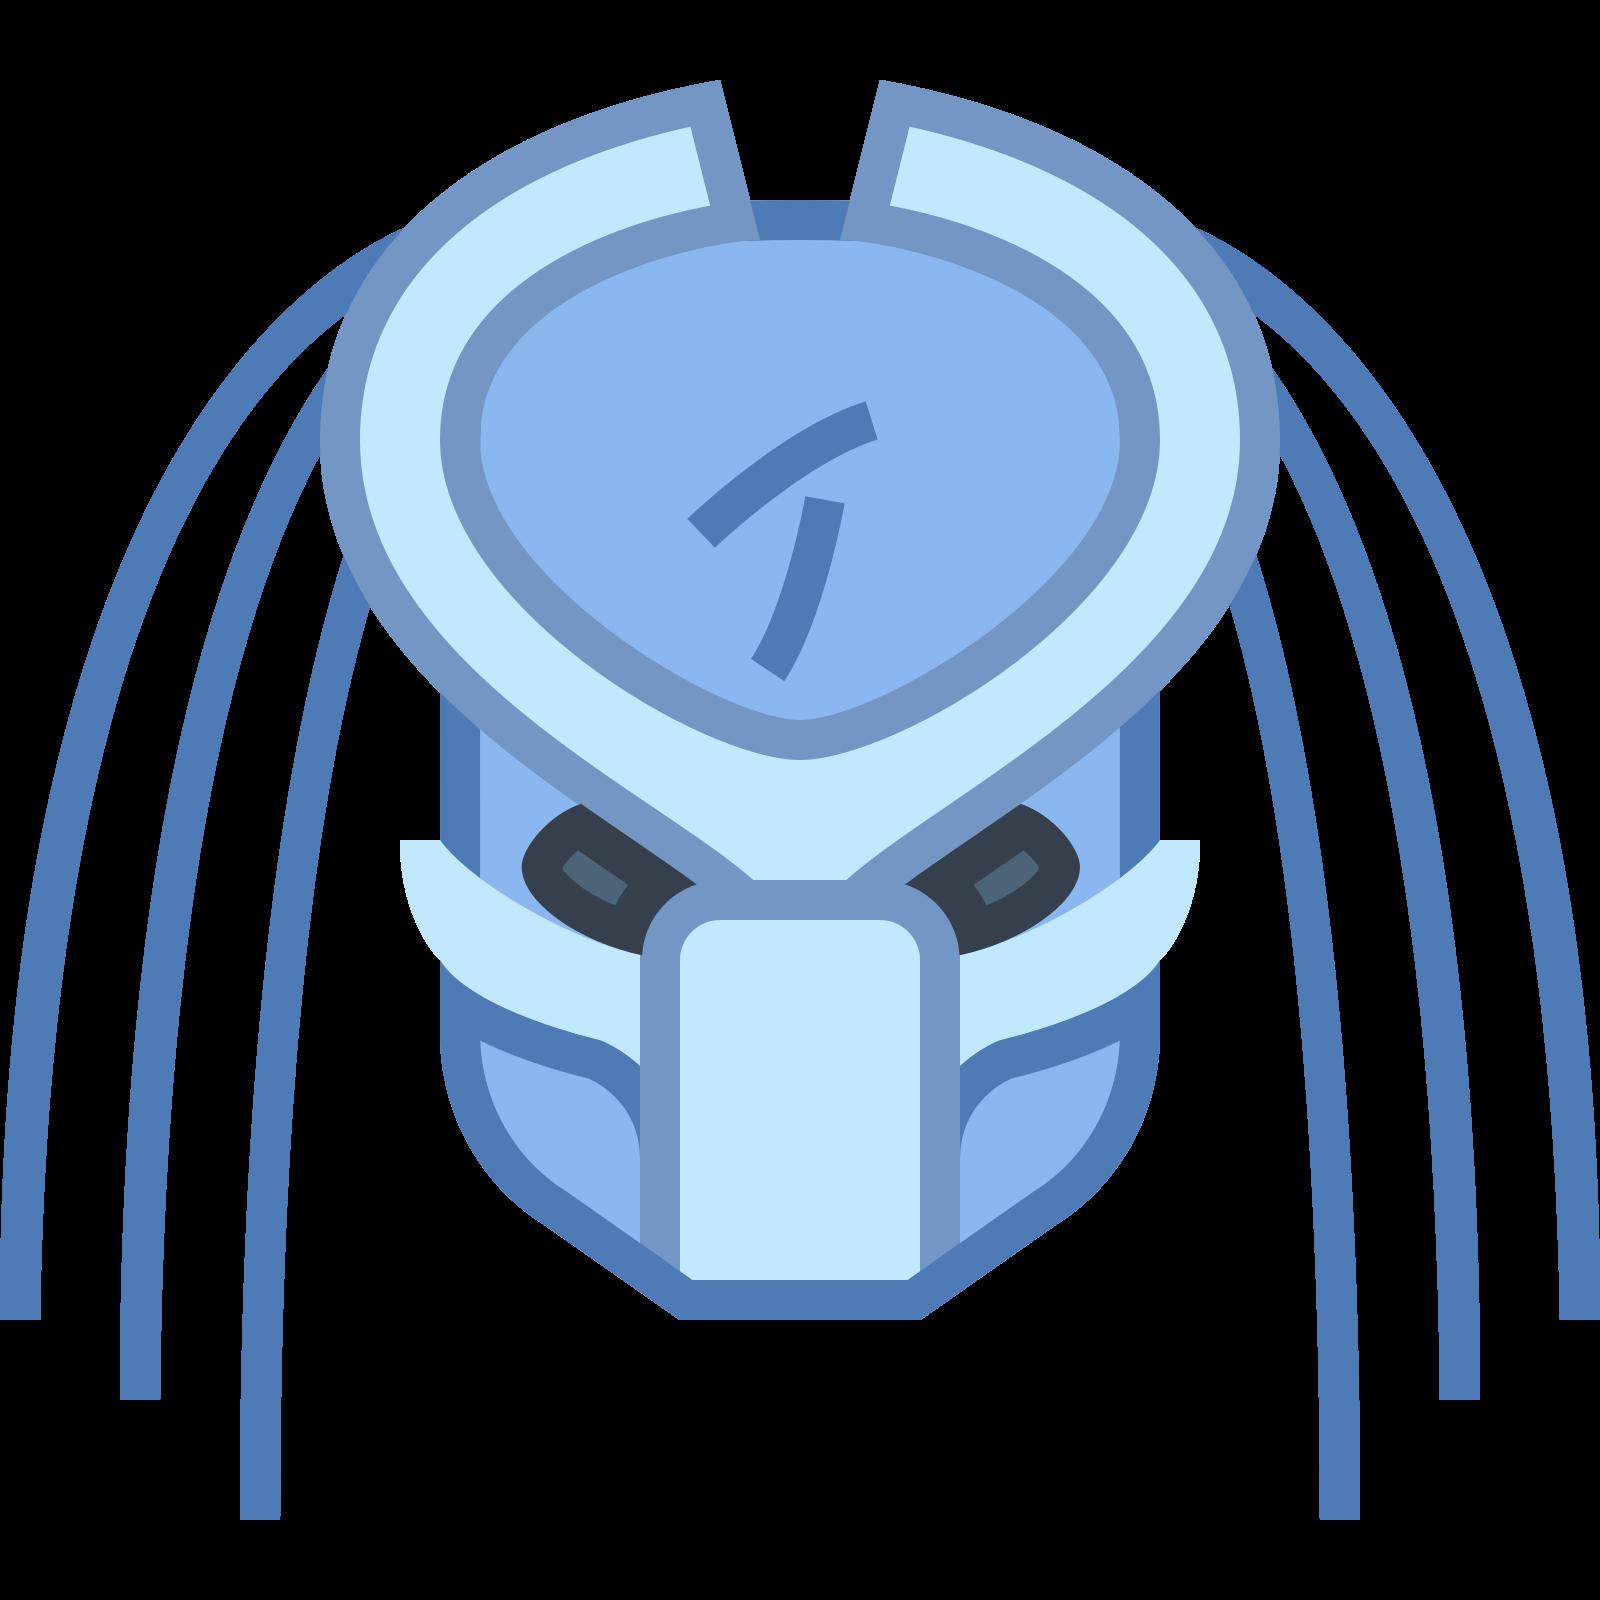 Predator icon